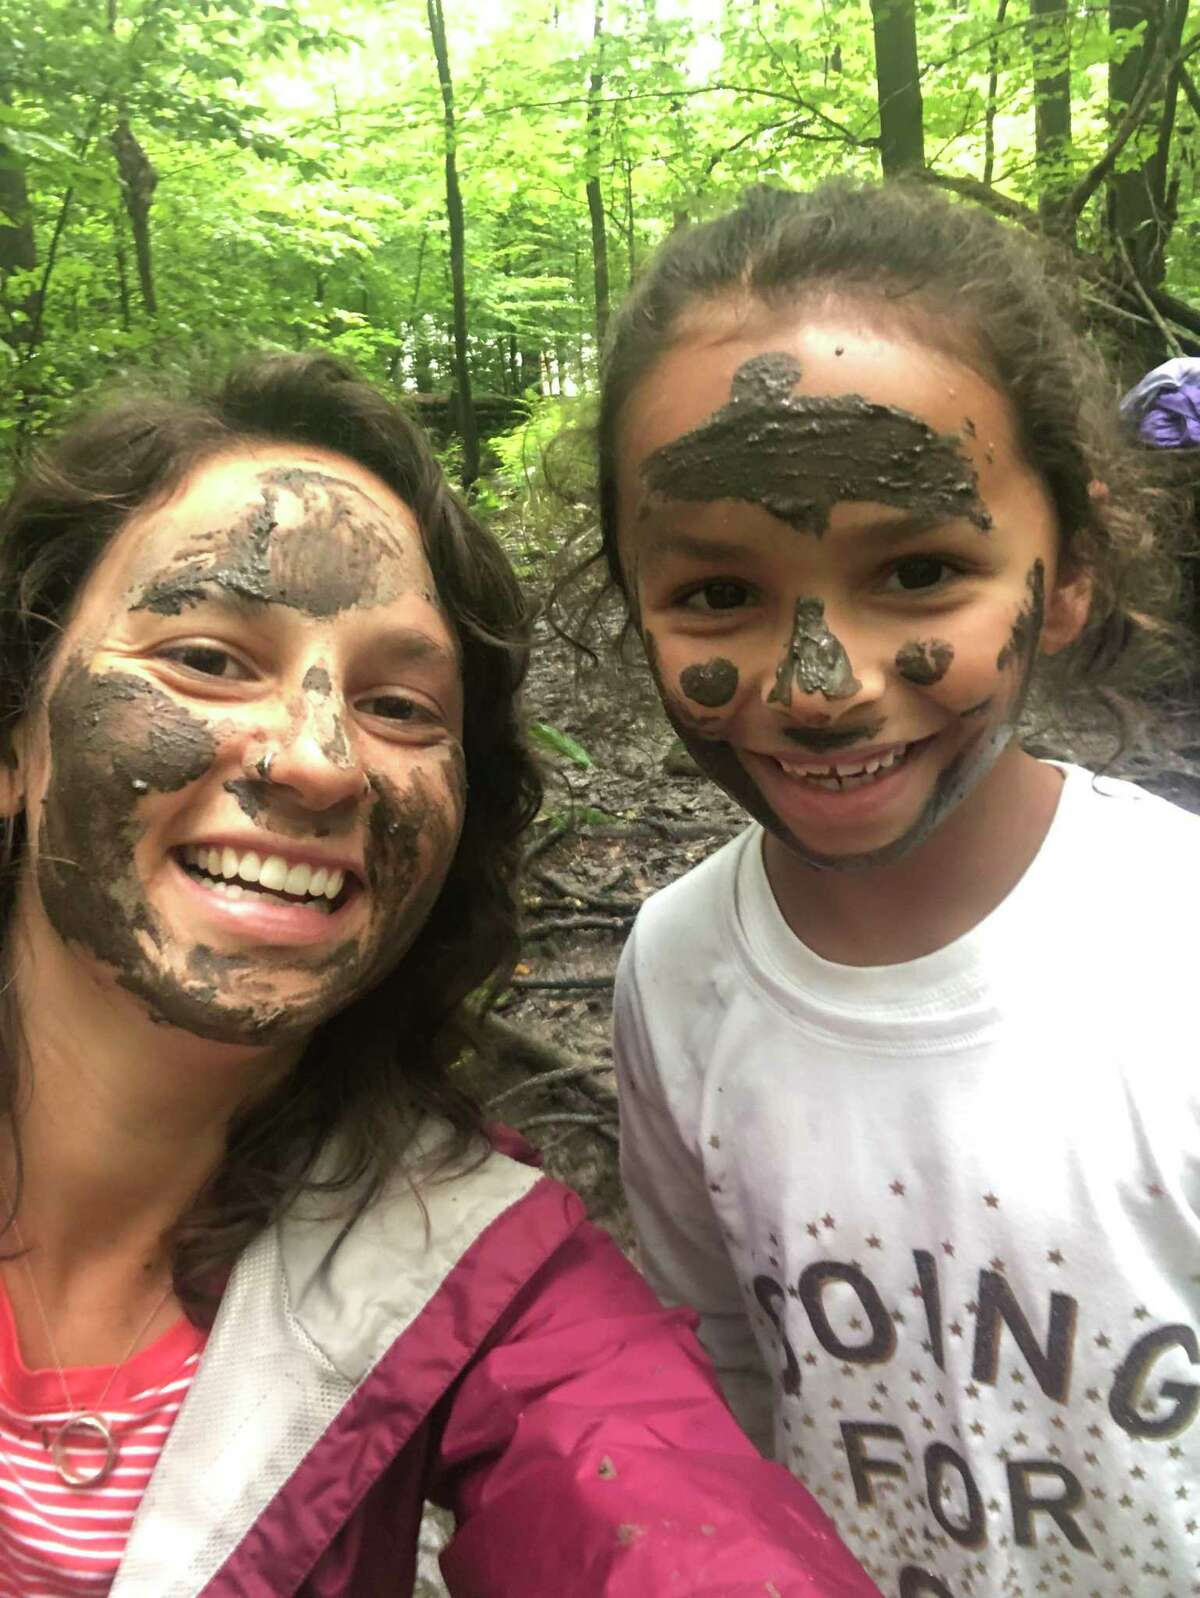 Summer Camp director Victoria Heyne and a camper in mud masks.